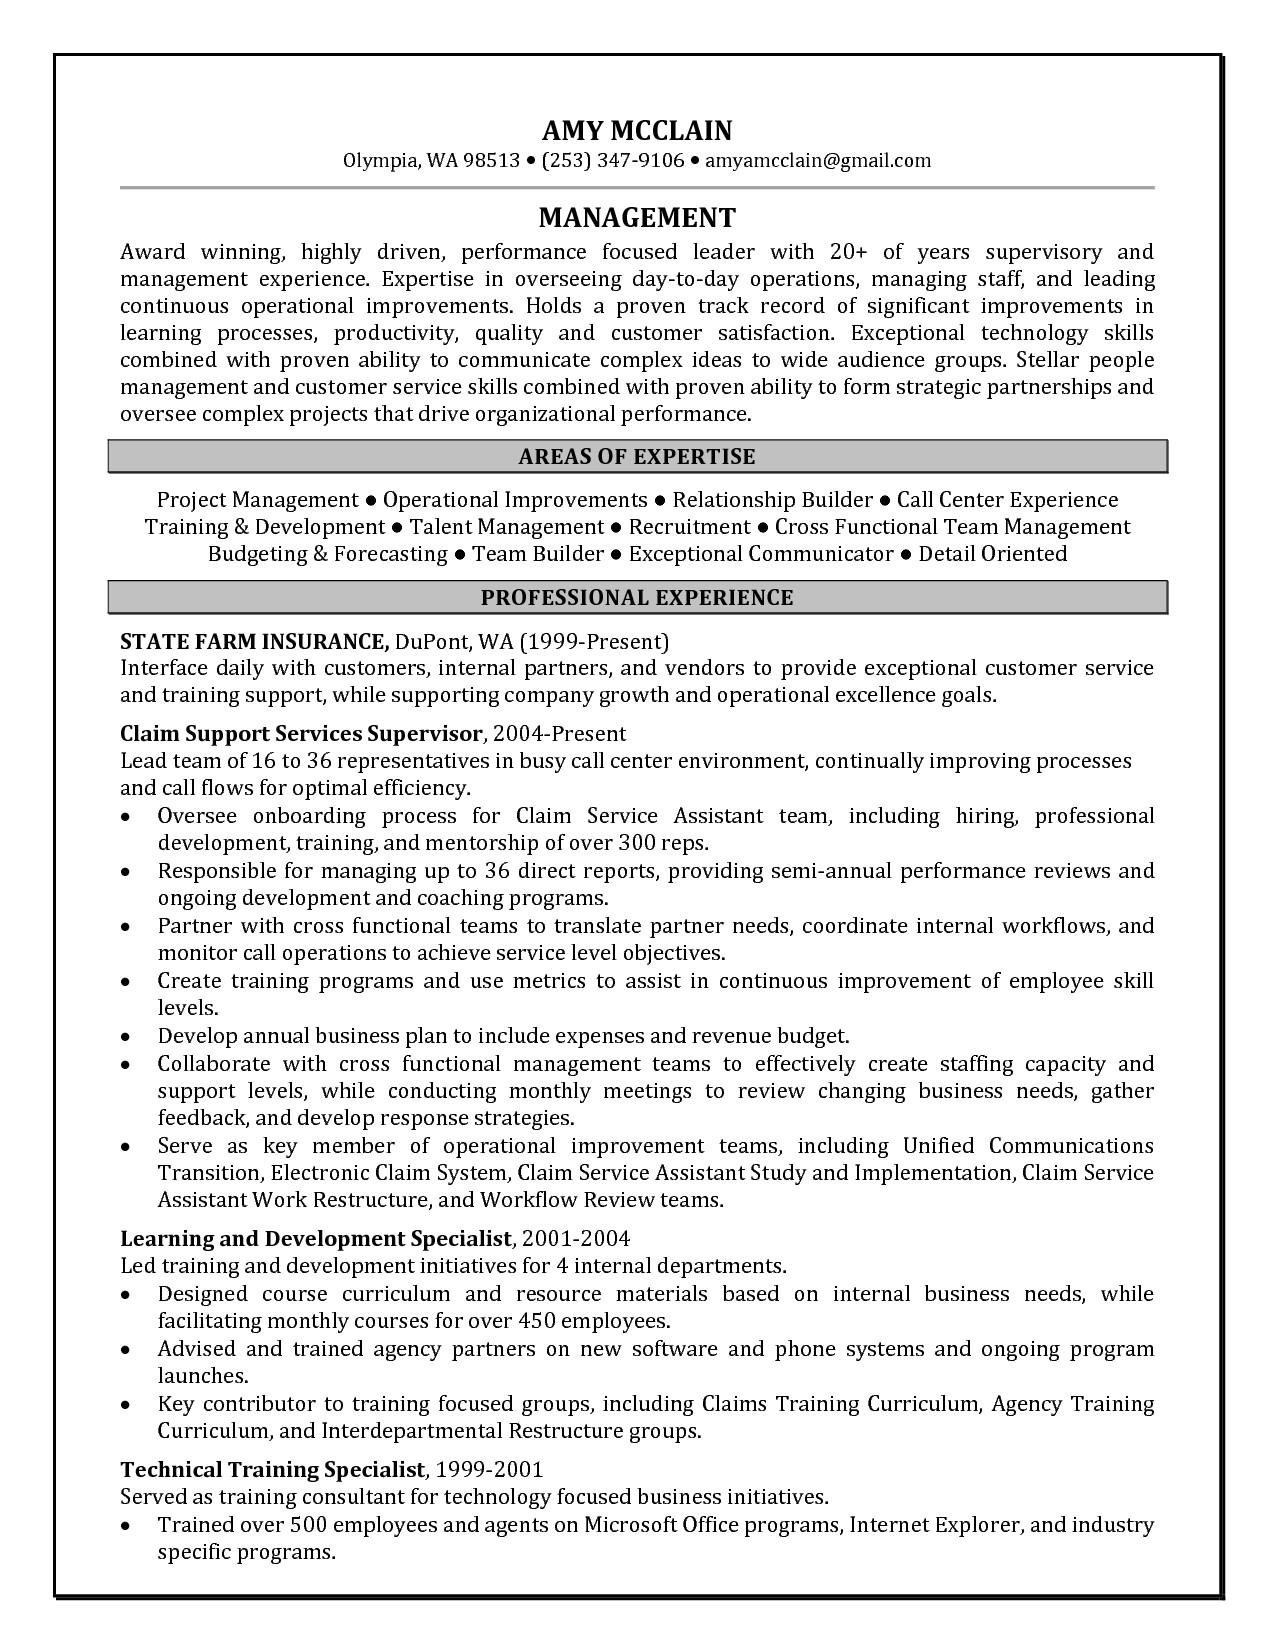 Sample Objectives In Resume for Call Center Agent Call Center Customer Service Job Description Resume